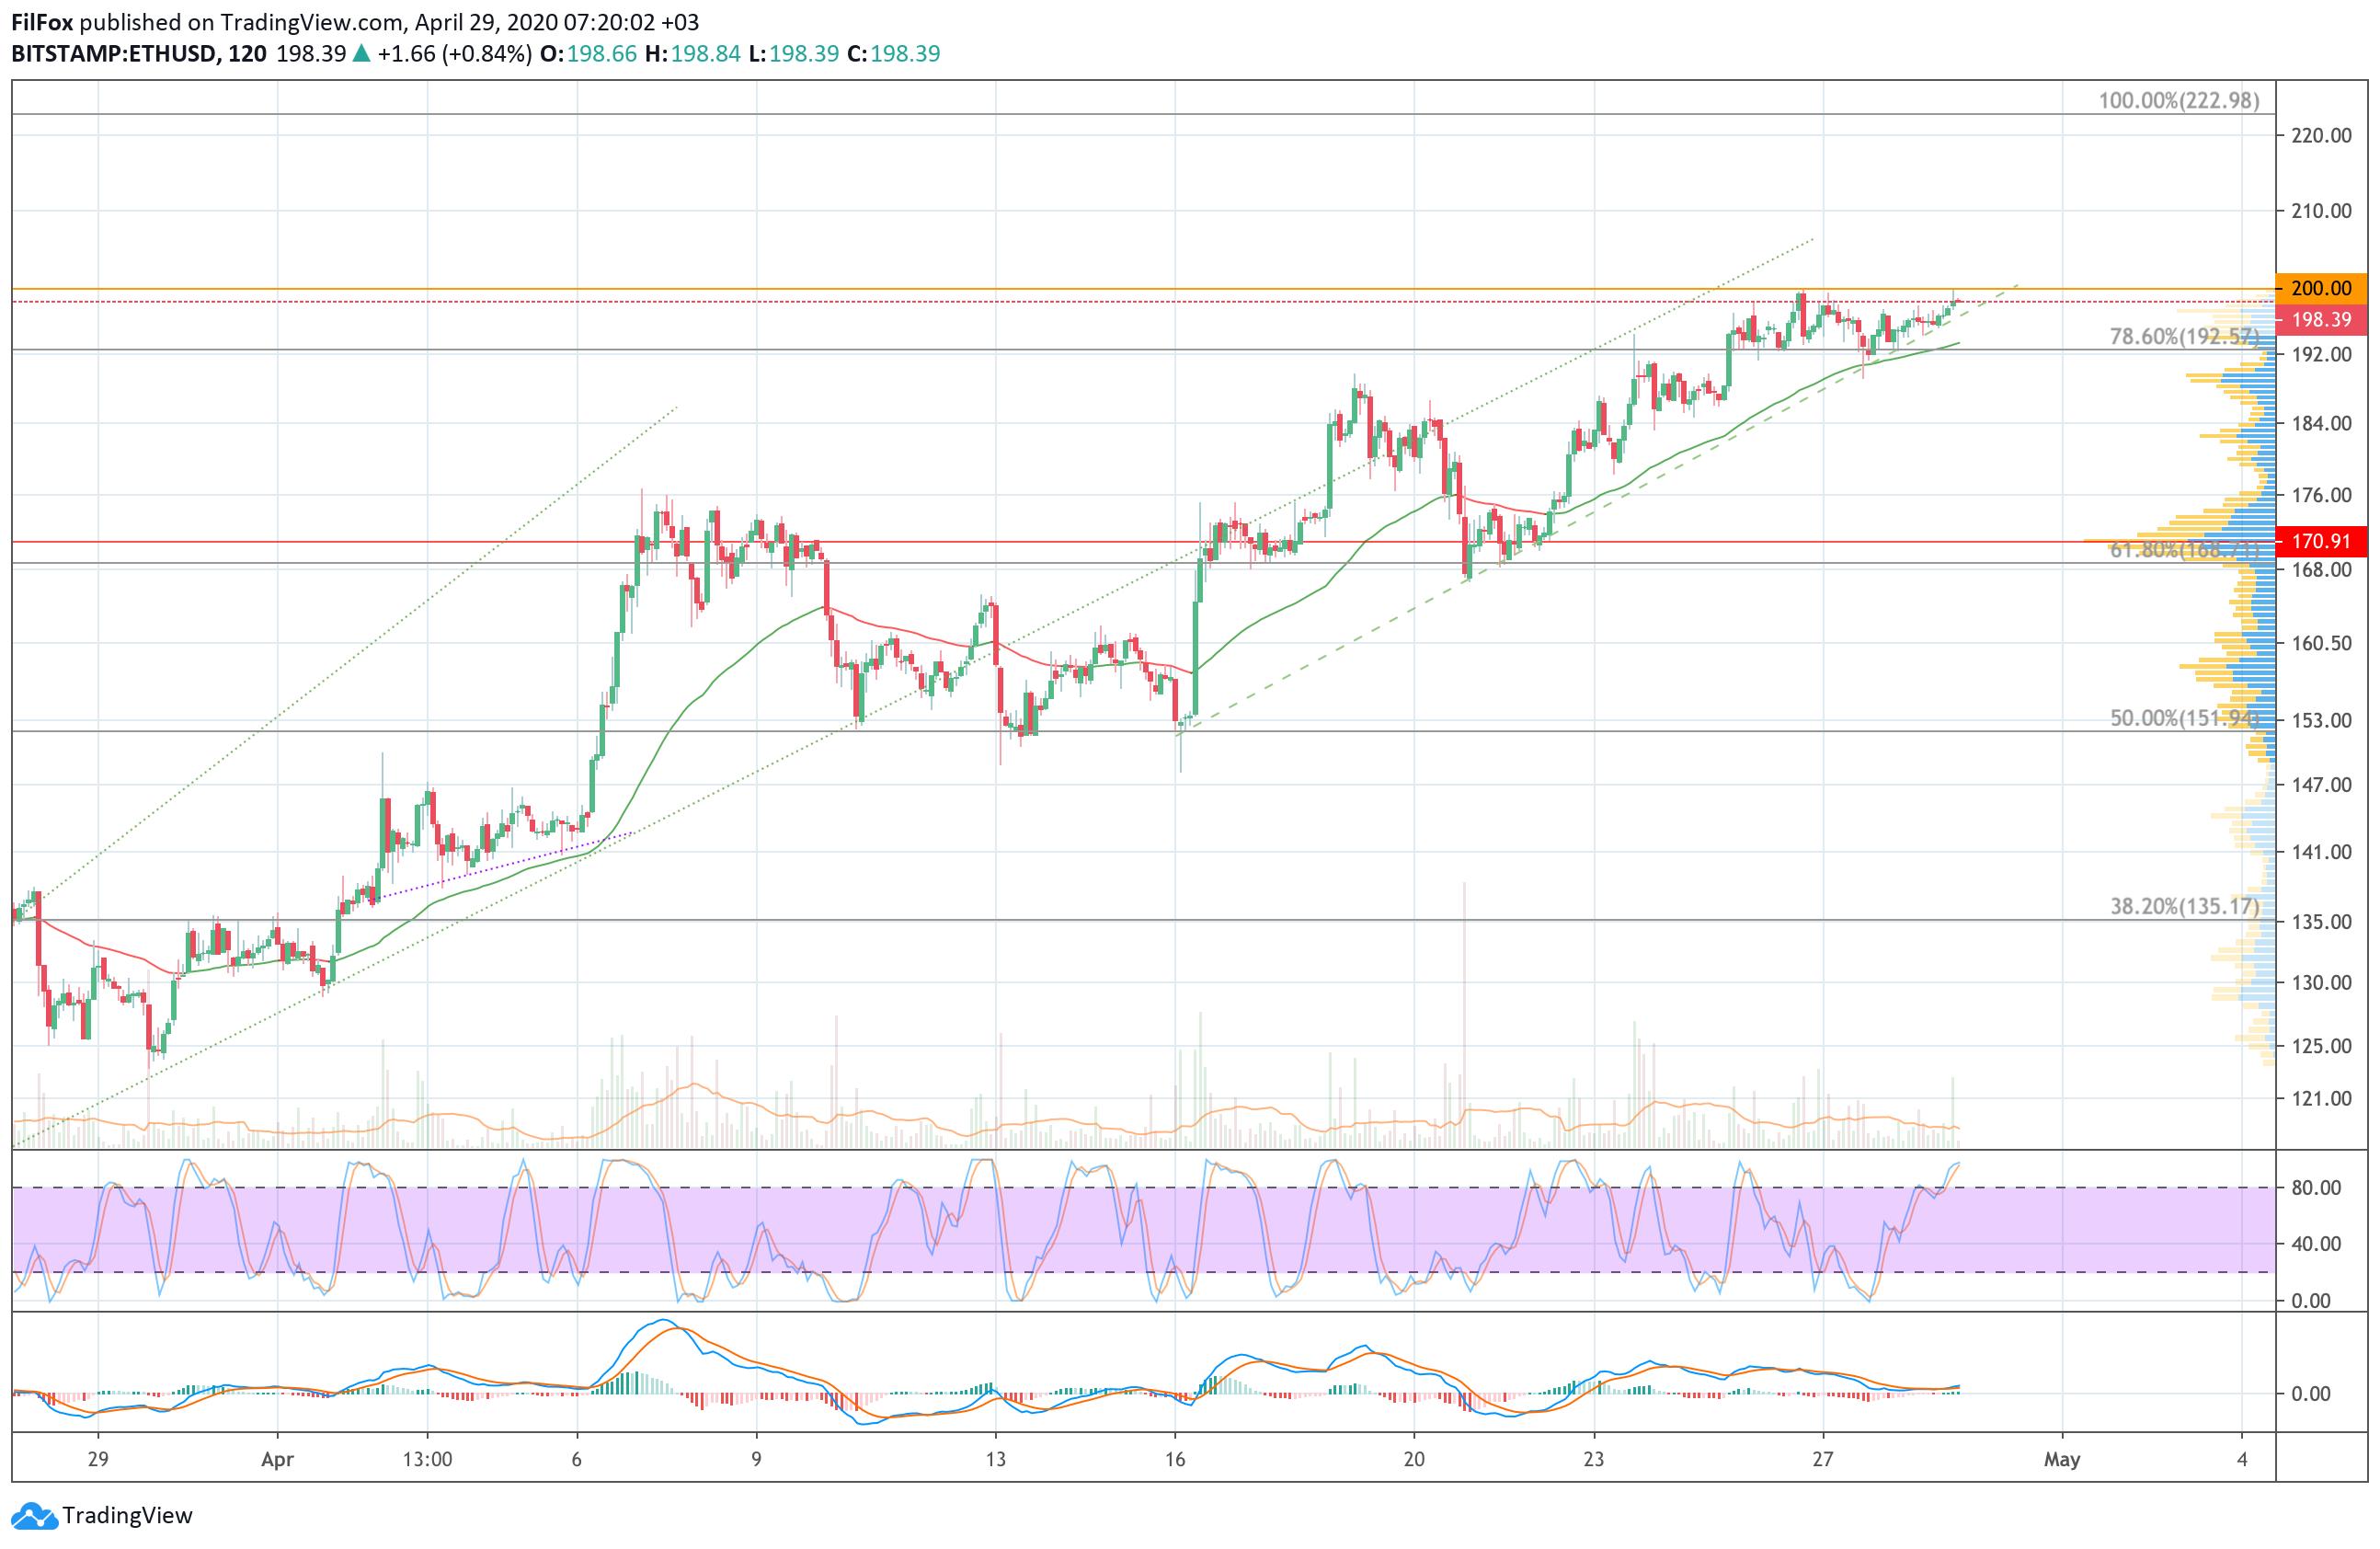 bitcoin likme samazinājās